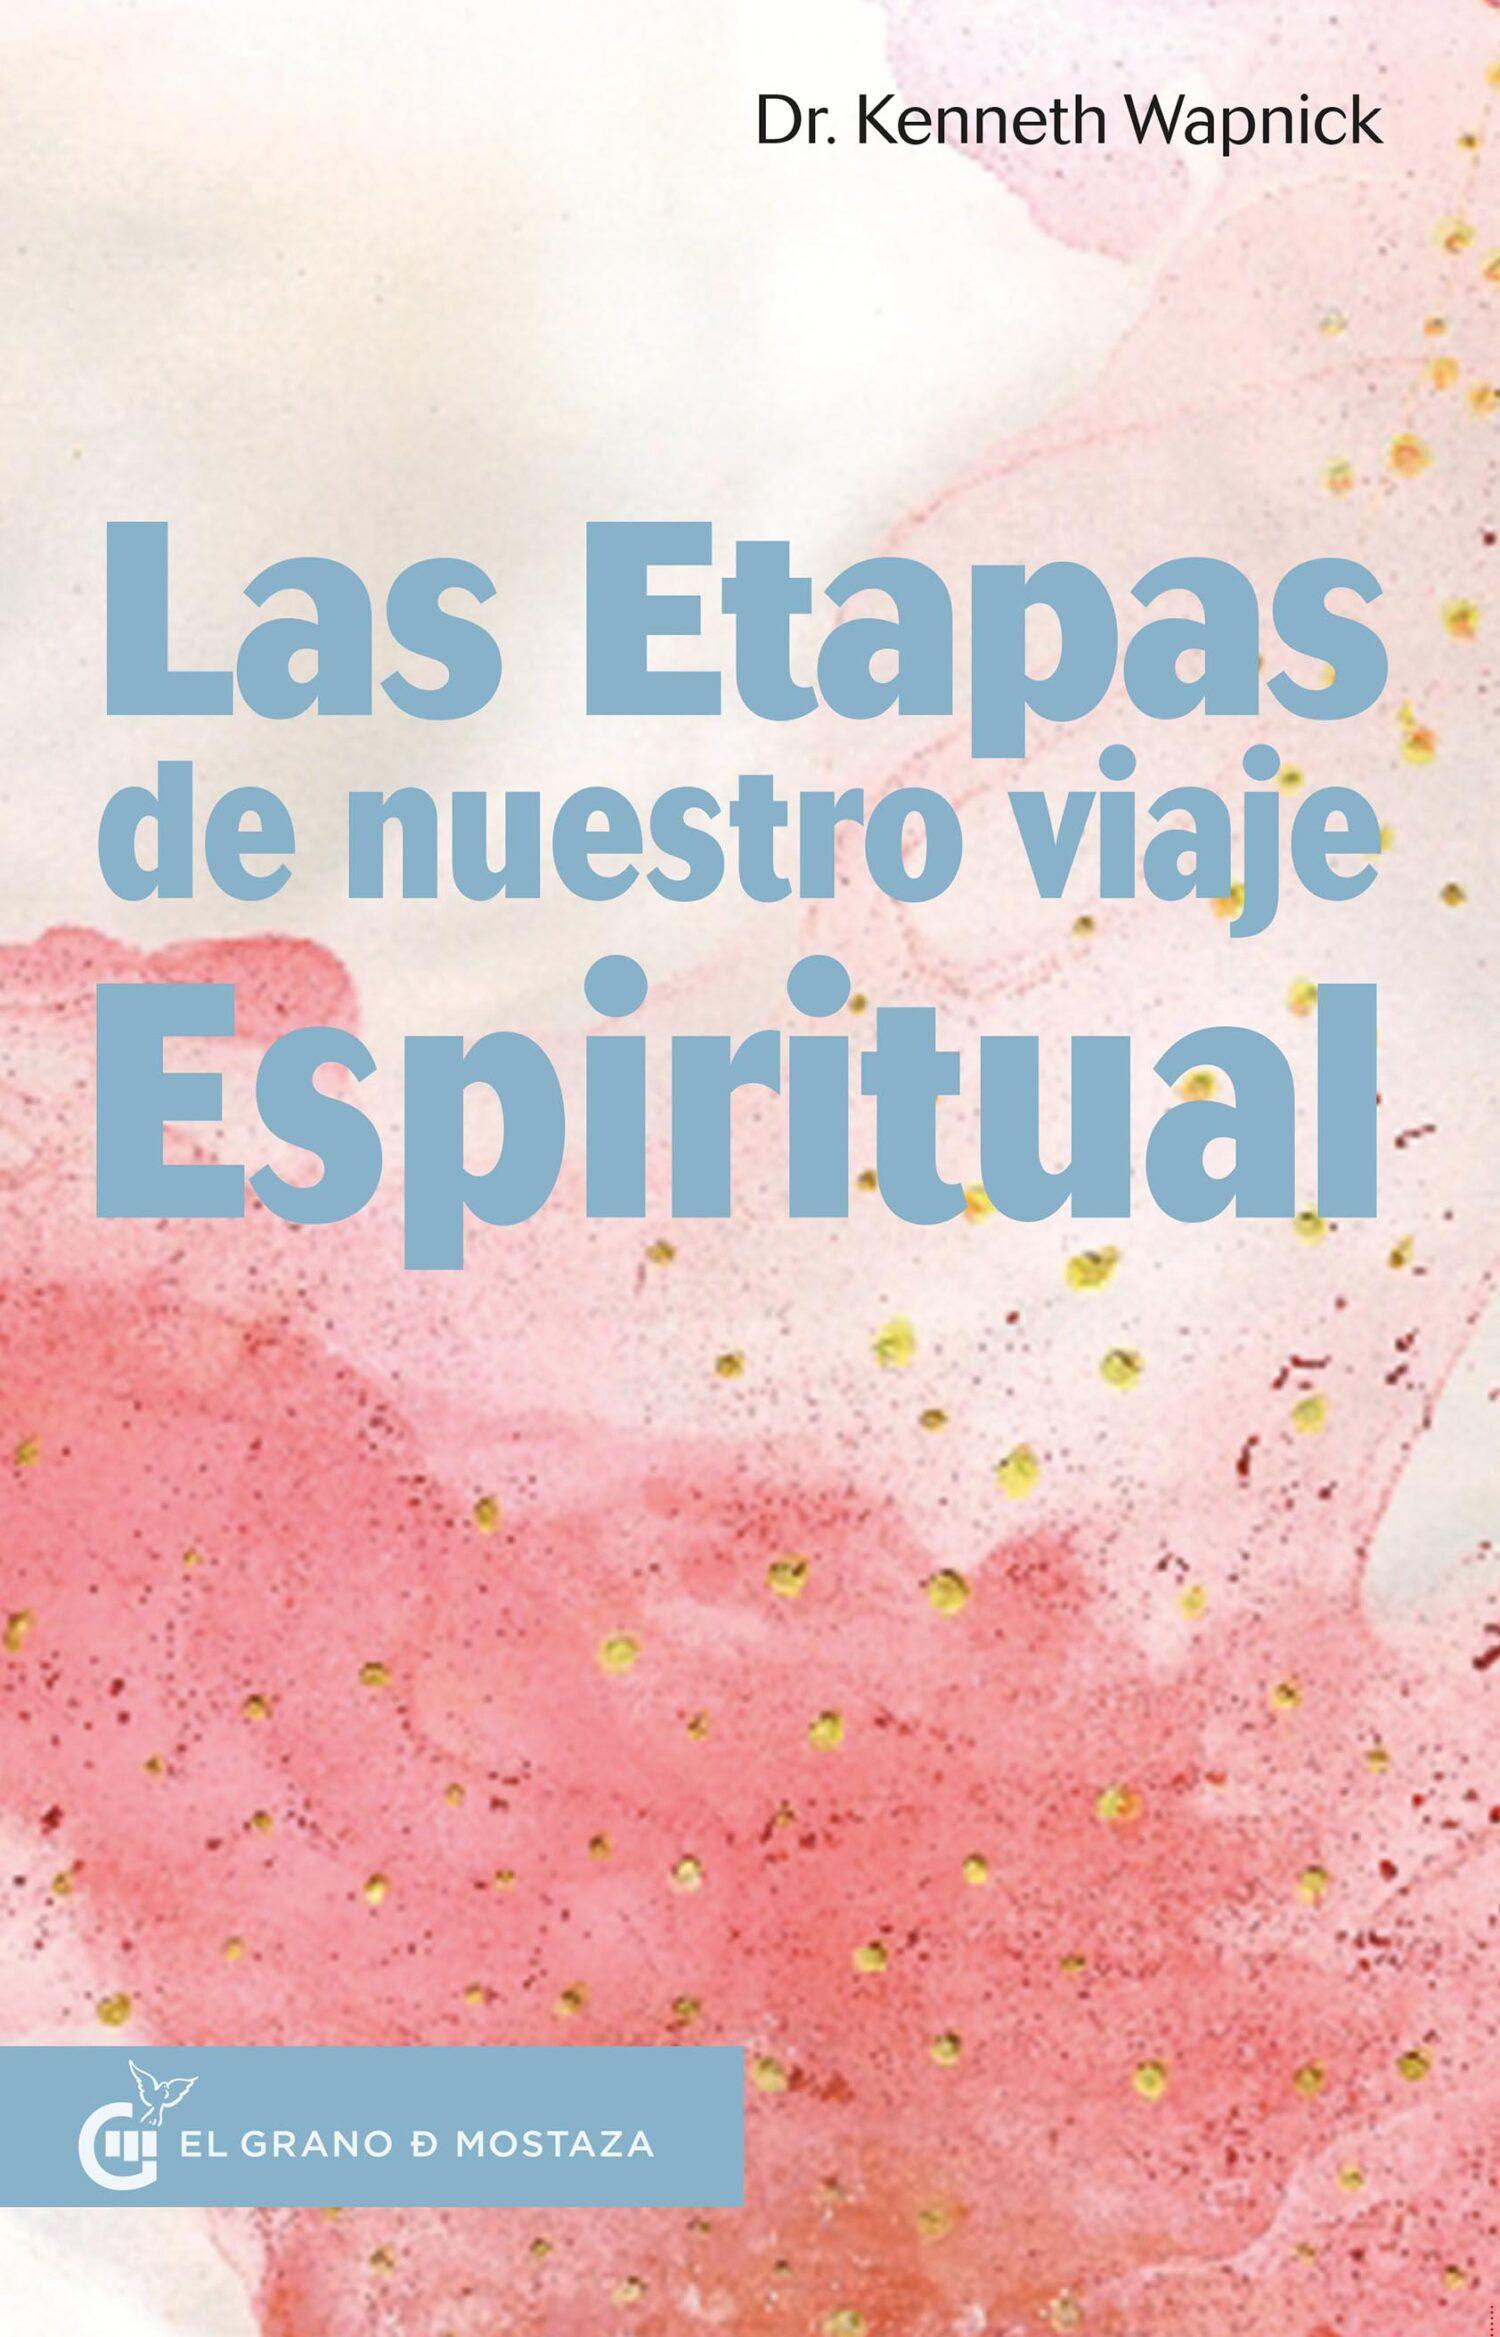 portada kwn wapnick etapas viaje espiritual